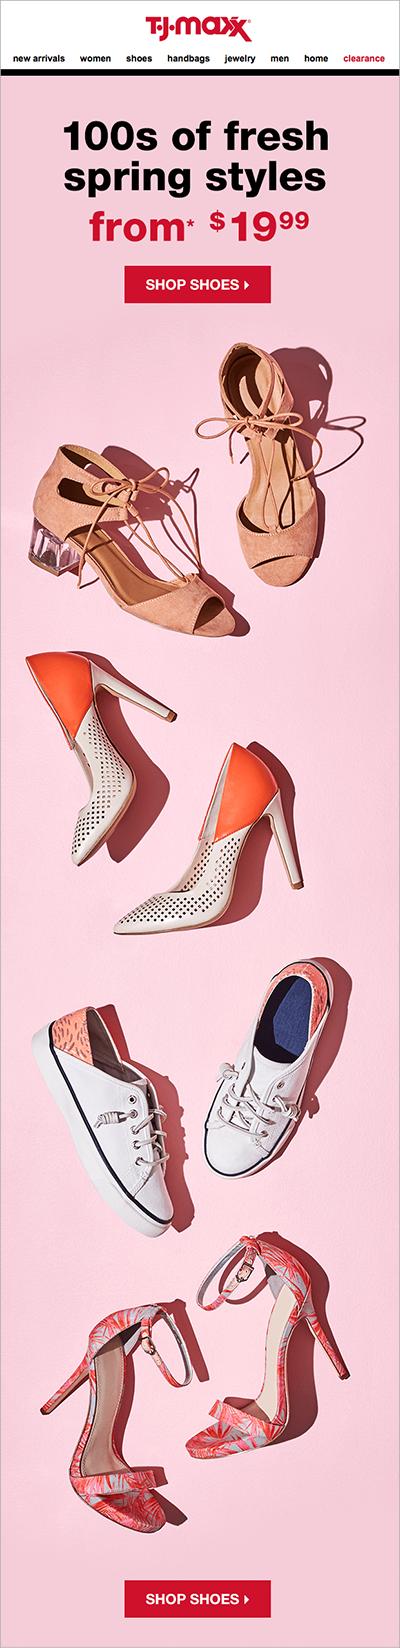 tjmaxx_portfolio_shoes.png